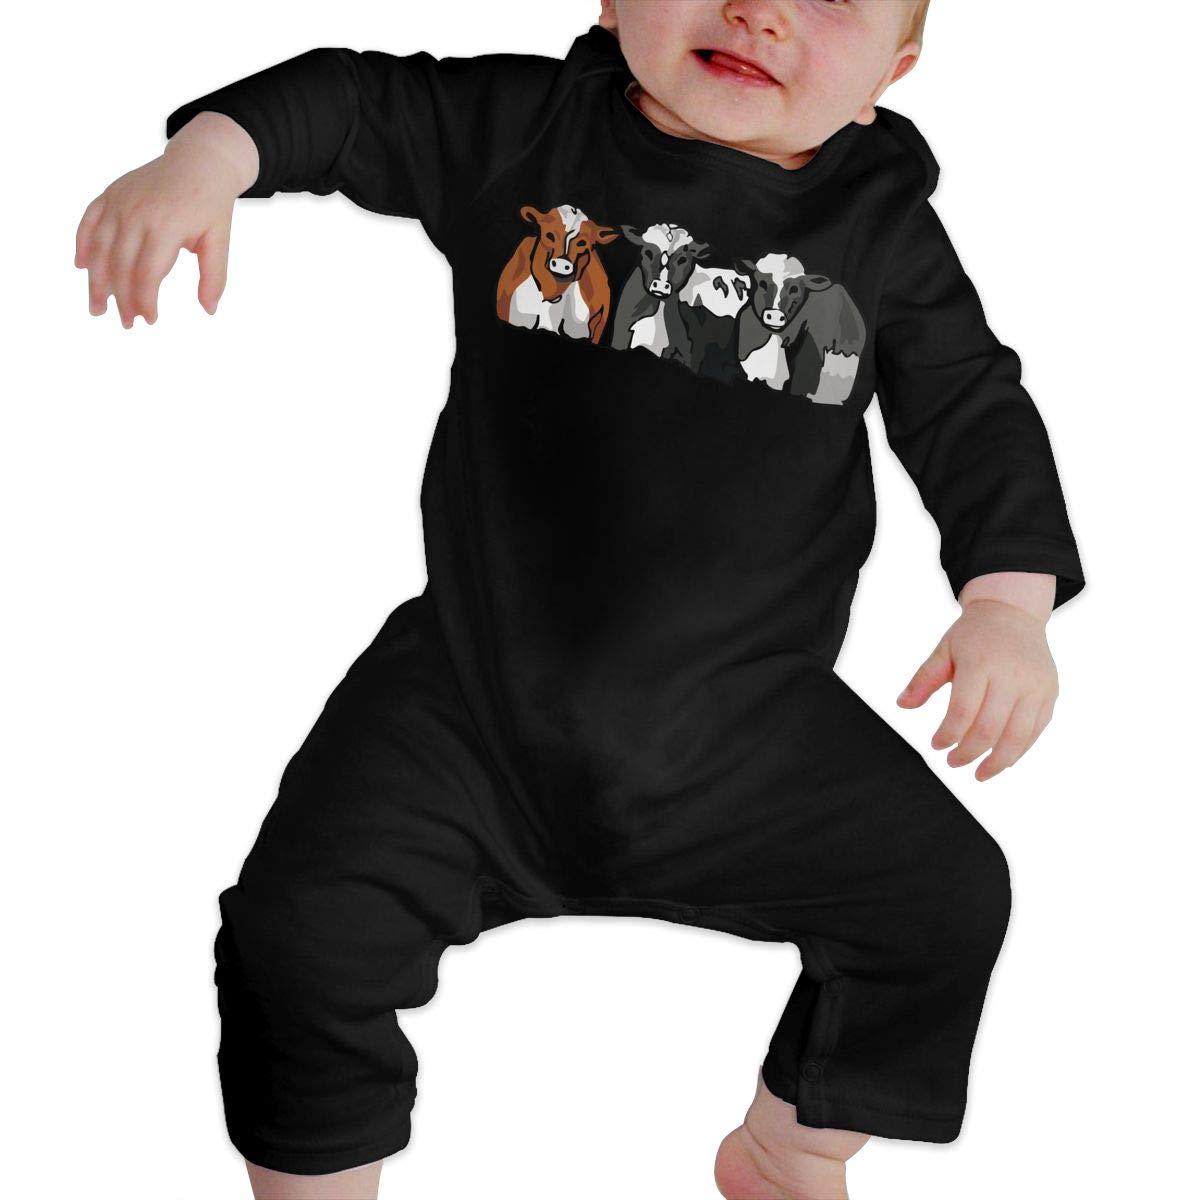 YUE--3BODY Cartoon Cow Baby Girl Long Sleeve Baby Girls Assorted Short Sleeve Bodysuit